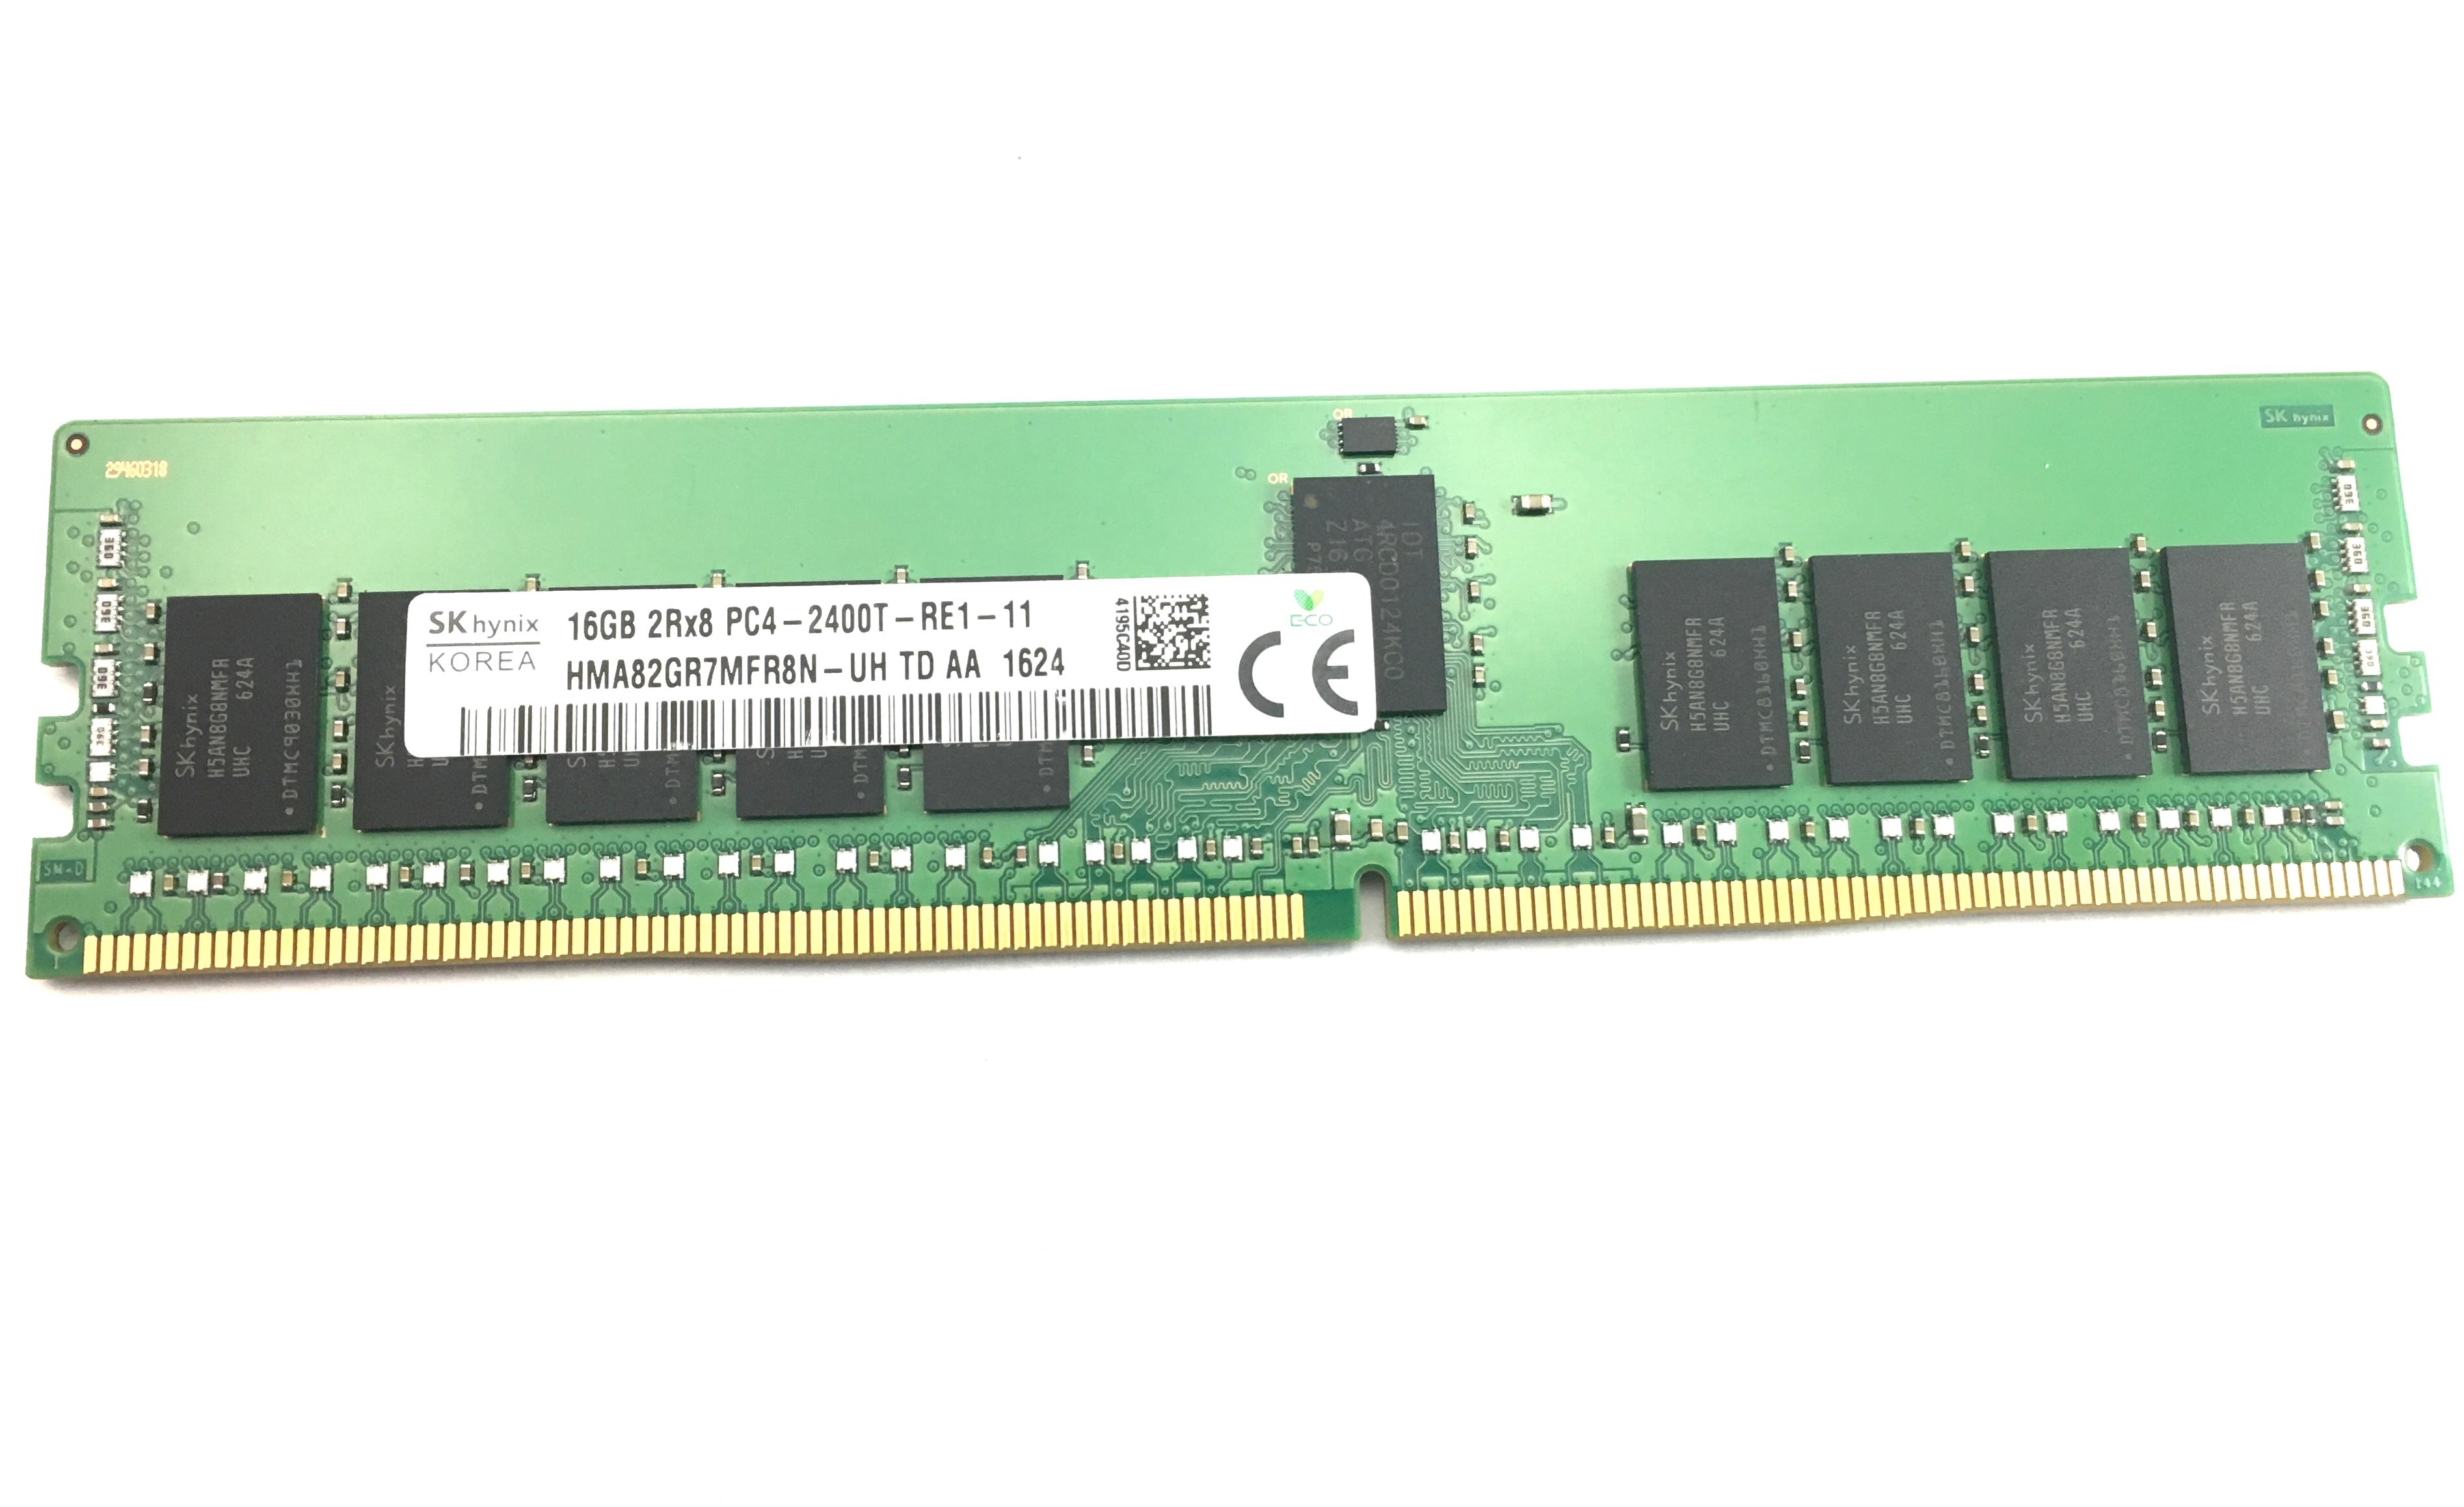 SKHynix 16GB 2Rx8 PC4-2400T DDR4 ECC Registered Memory (HMA82GR7MFR8N-UH)